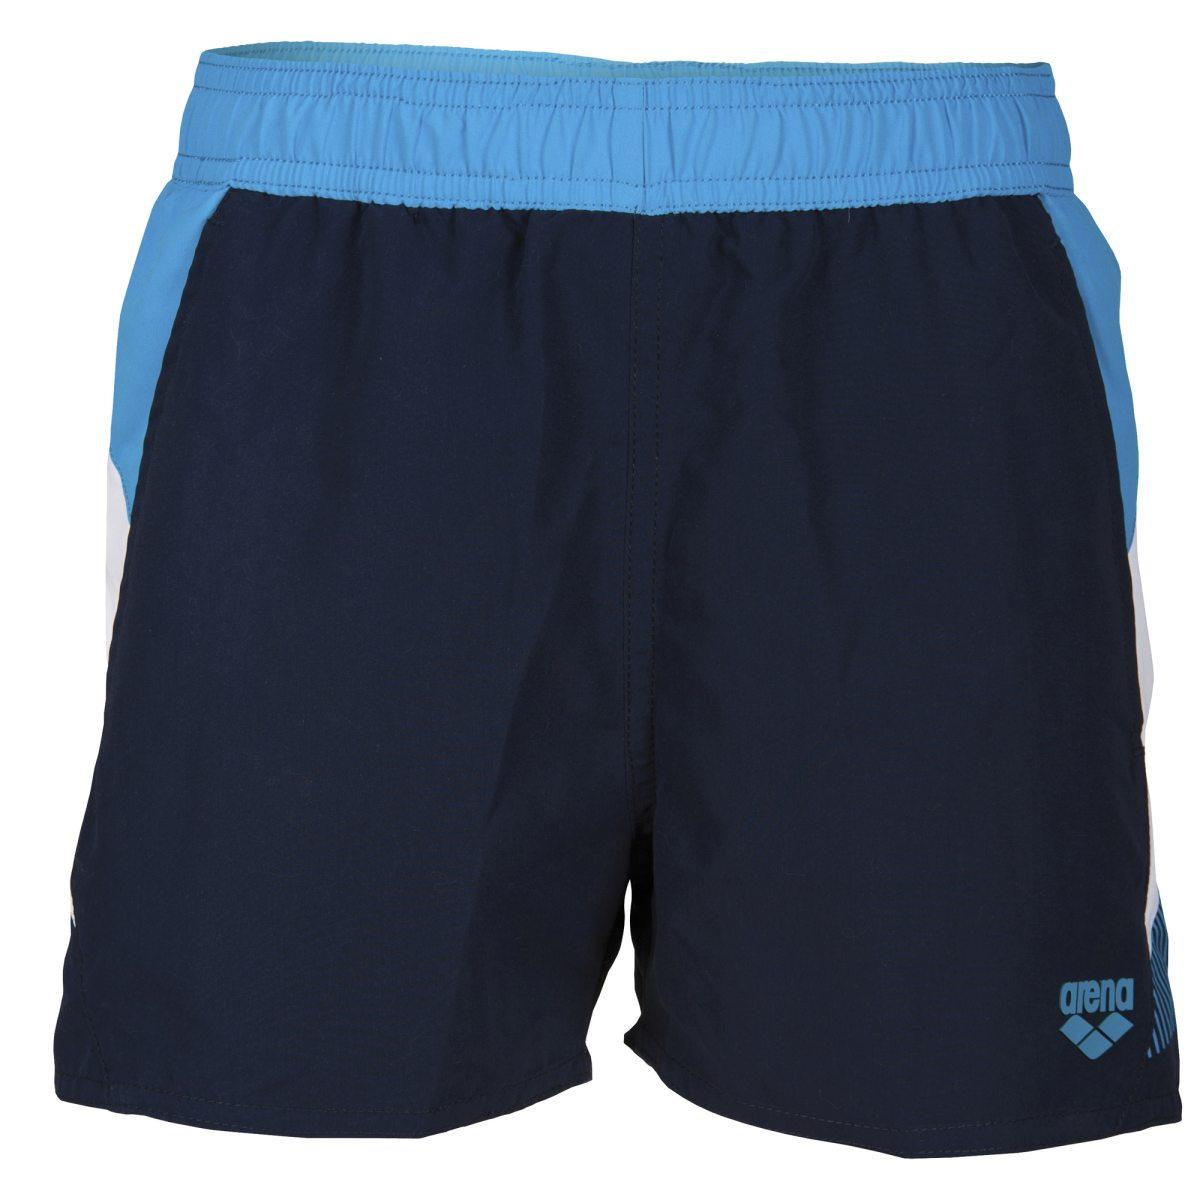 14e9693a43c arena fundamentals big logo short badshorts junior badkläder barn & jr